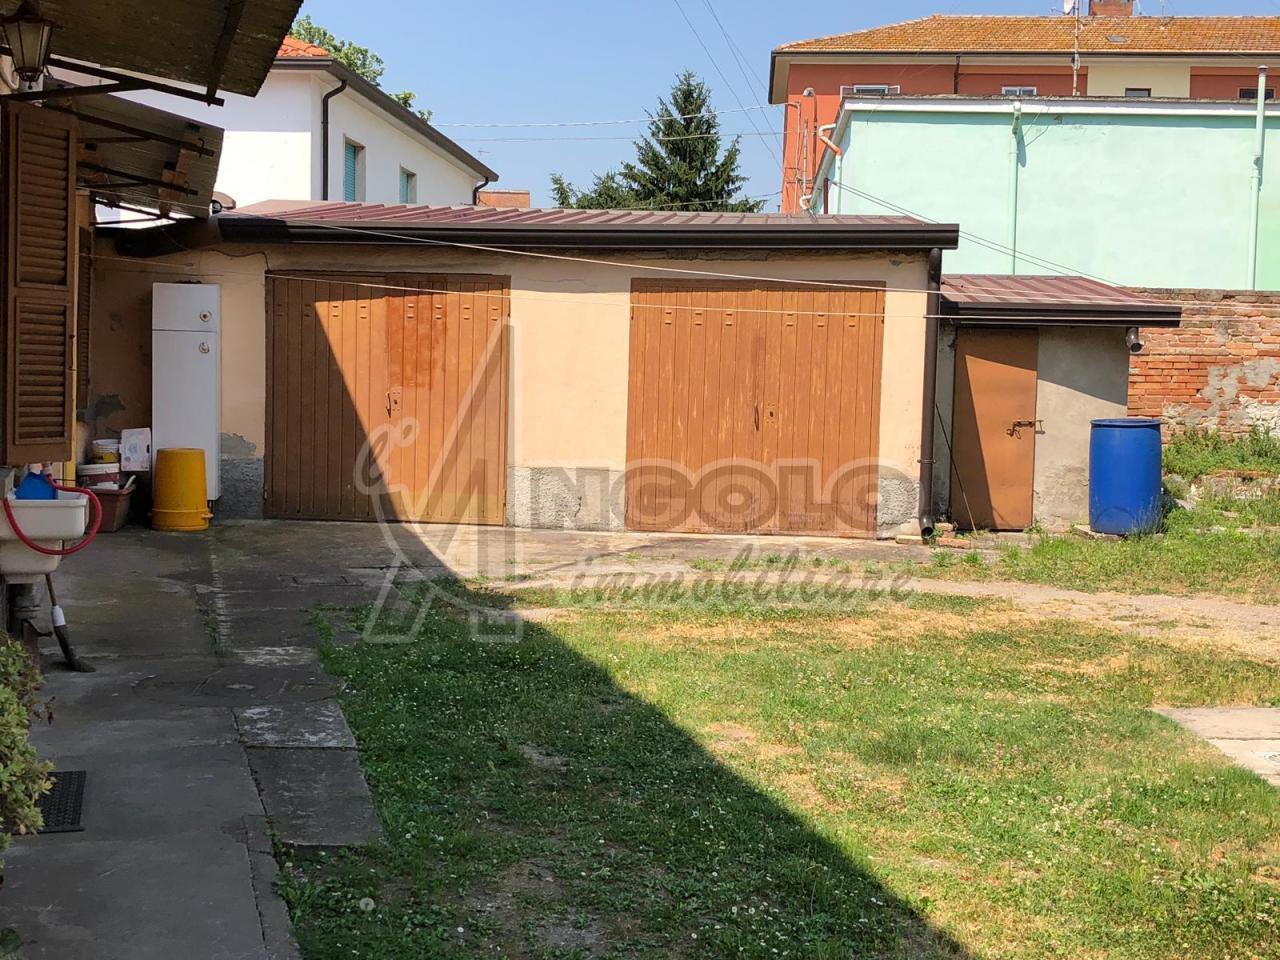 Appartamenti e Attici FERRARA vendita  FRAZIONI-PERIFERIA  L